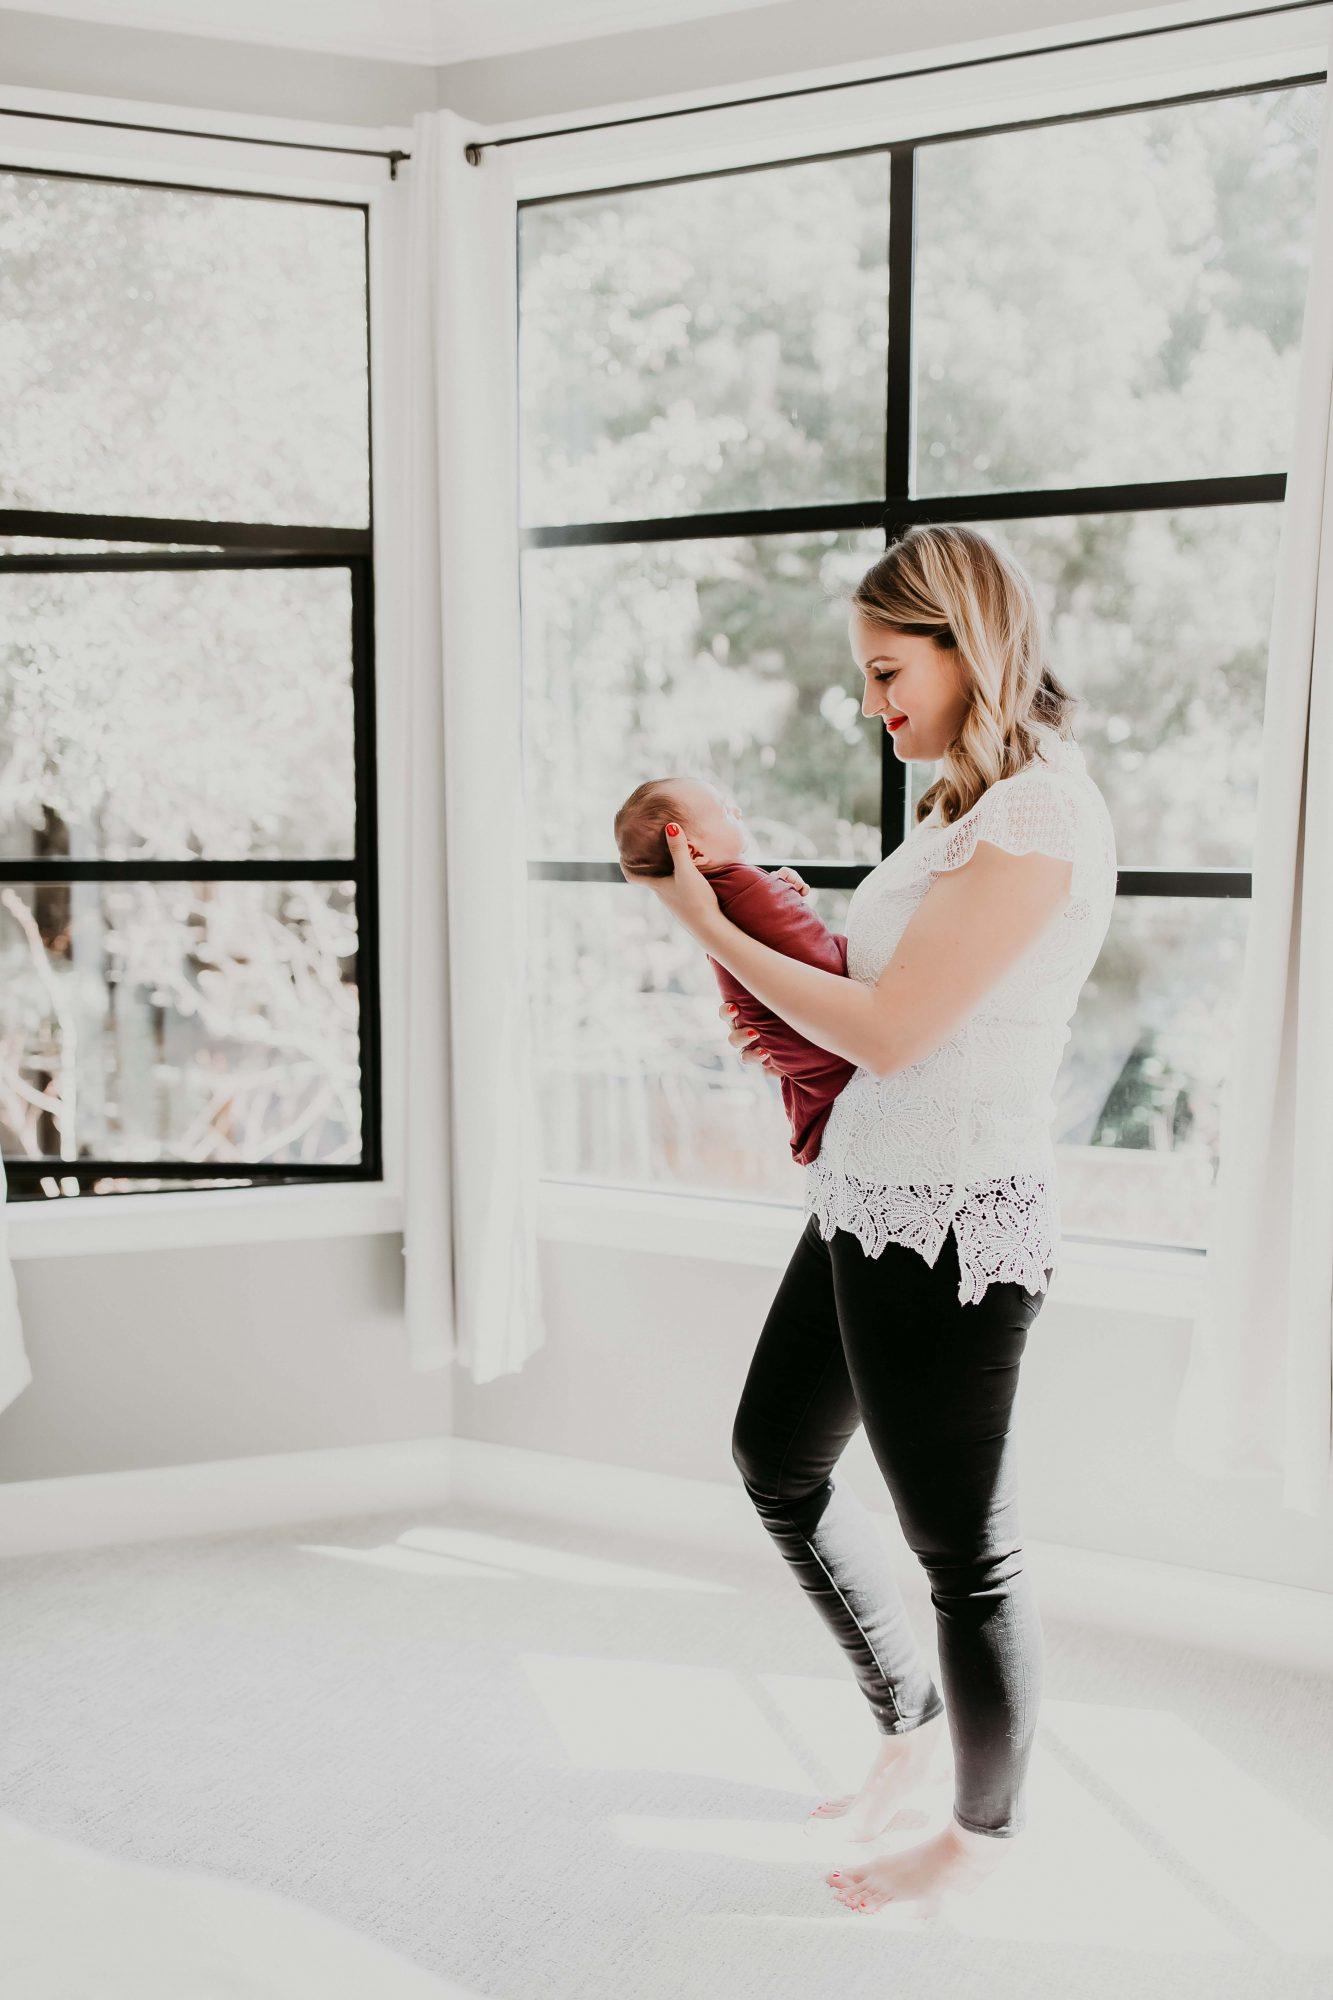 Newborn Photographer in San Francisco - 22